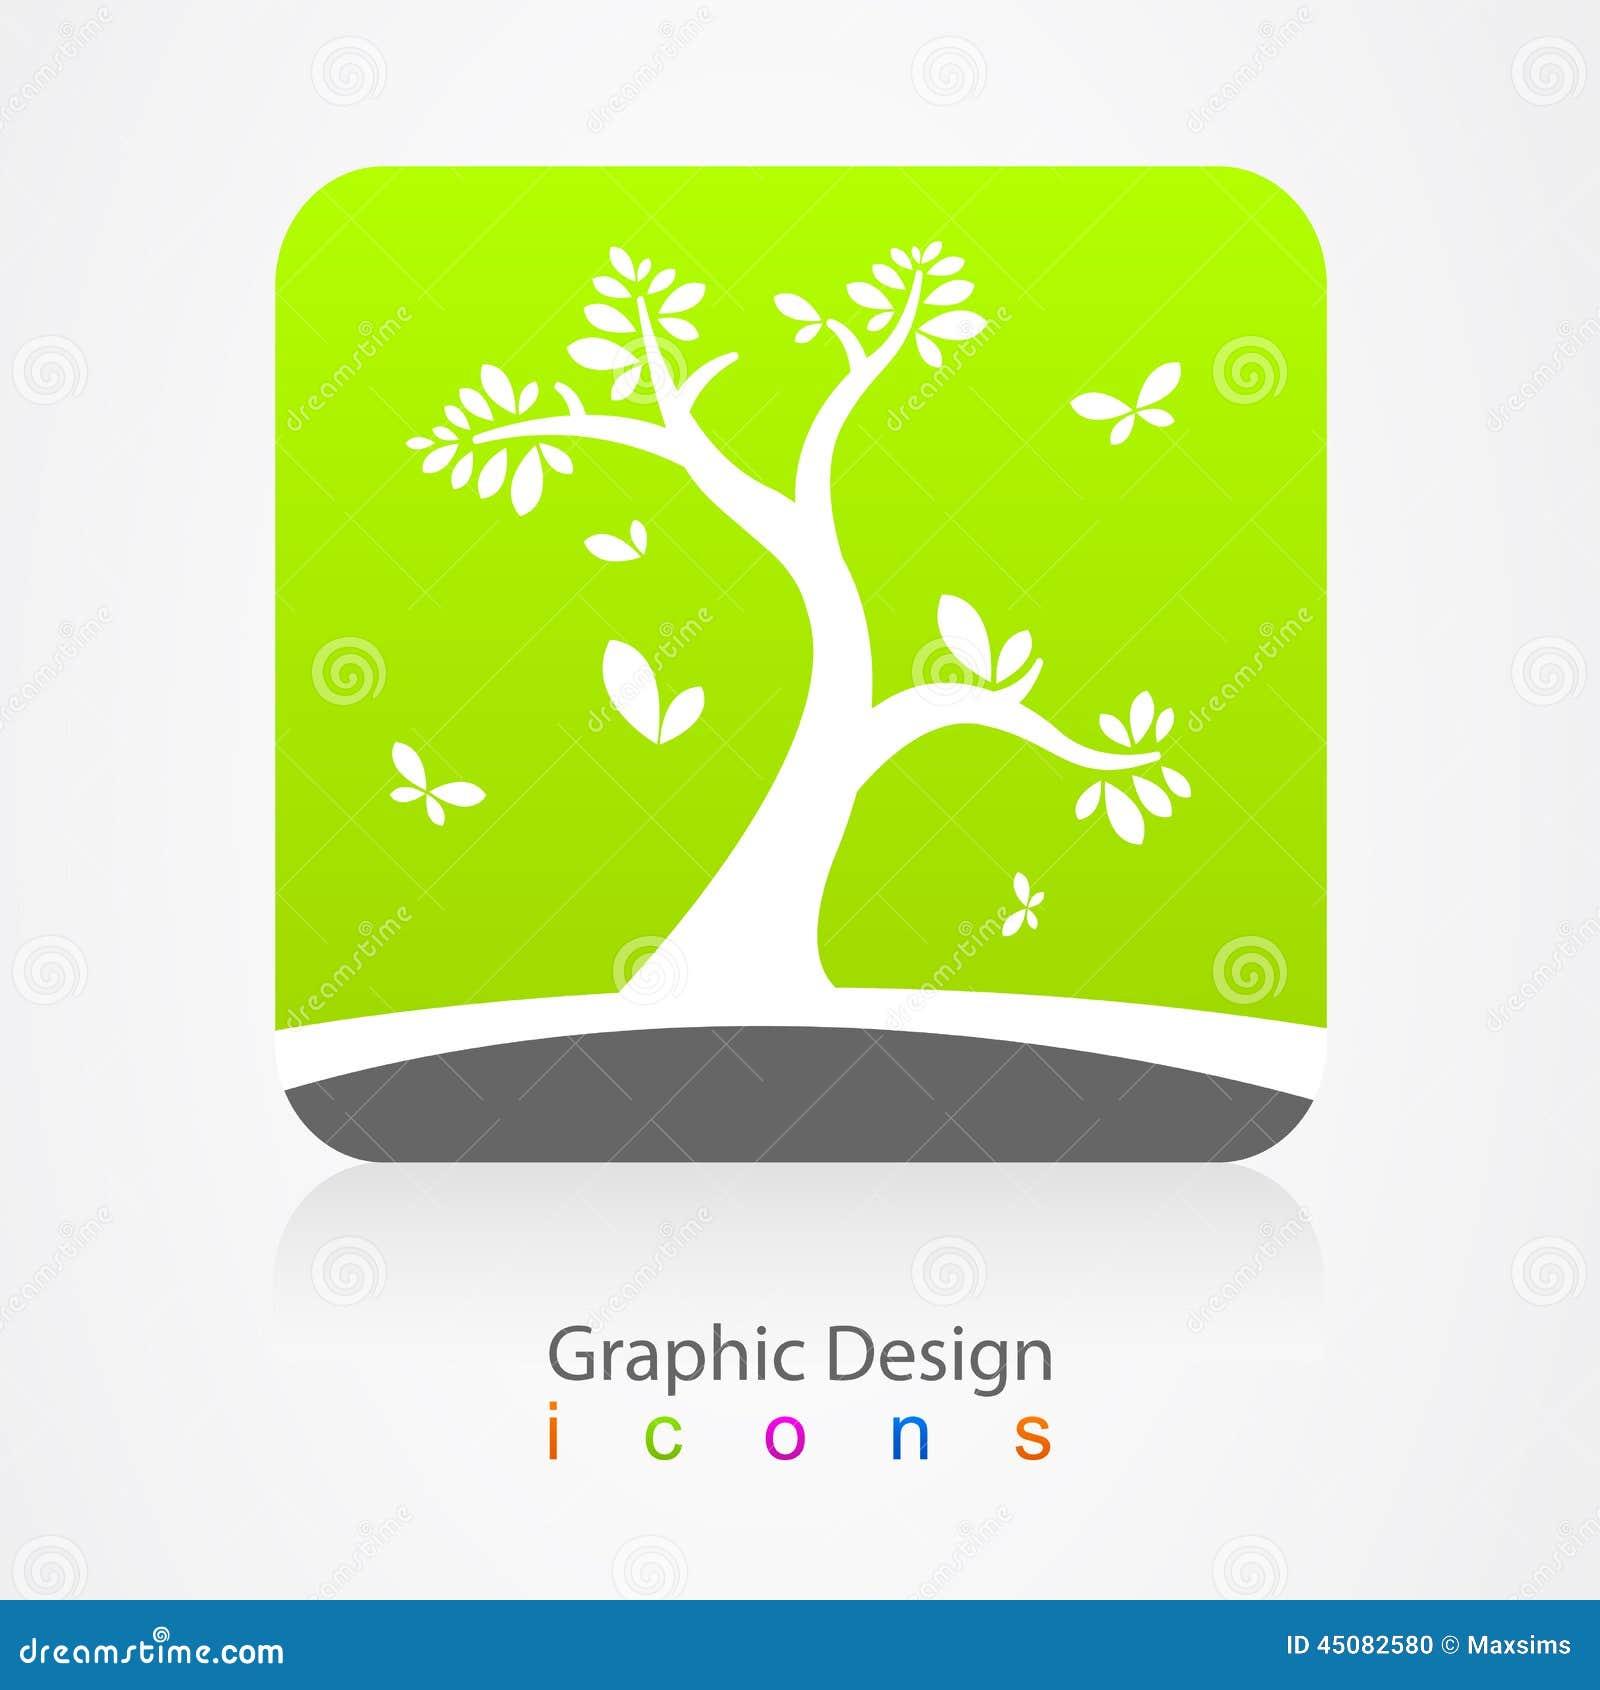 Vector graphic design business logo - Graphic Design Business Logo Tree Sign